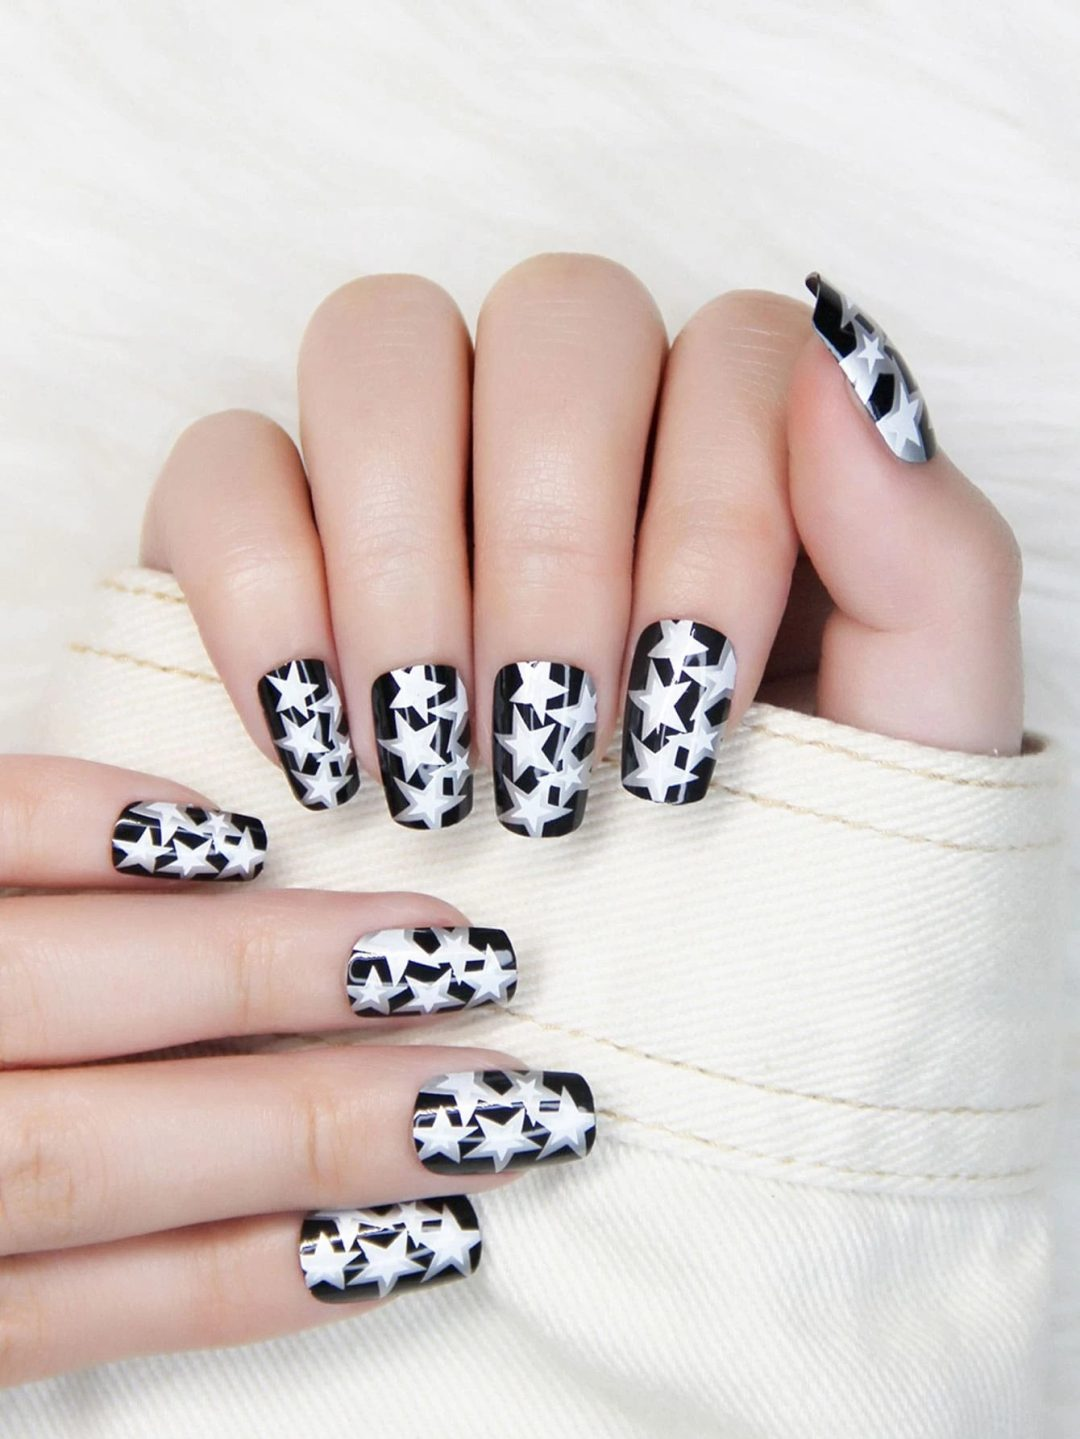 Black and white star nails